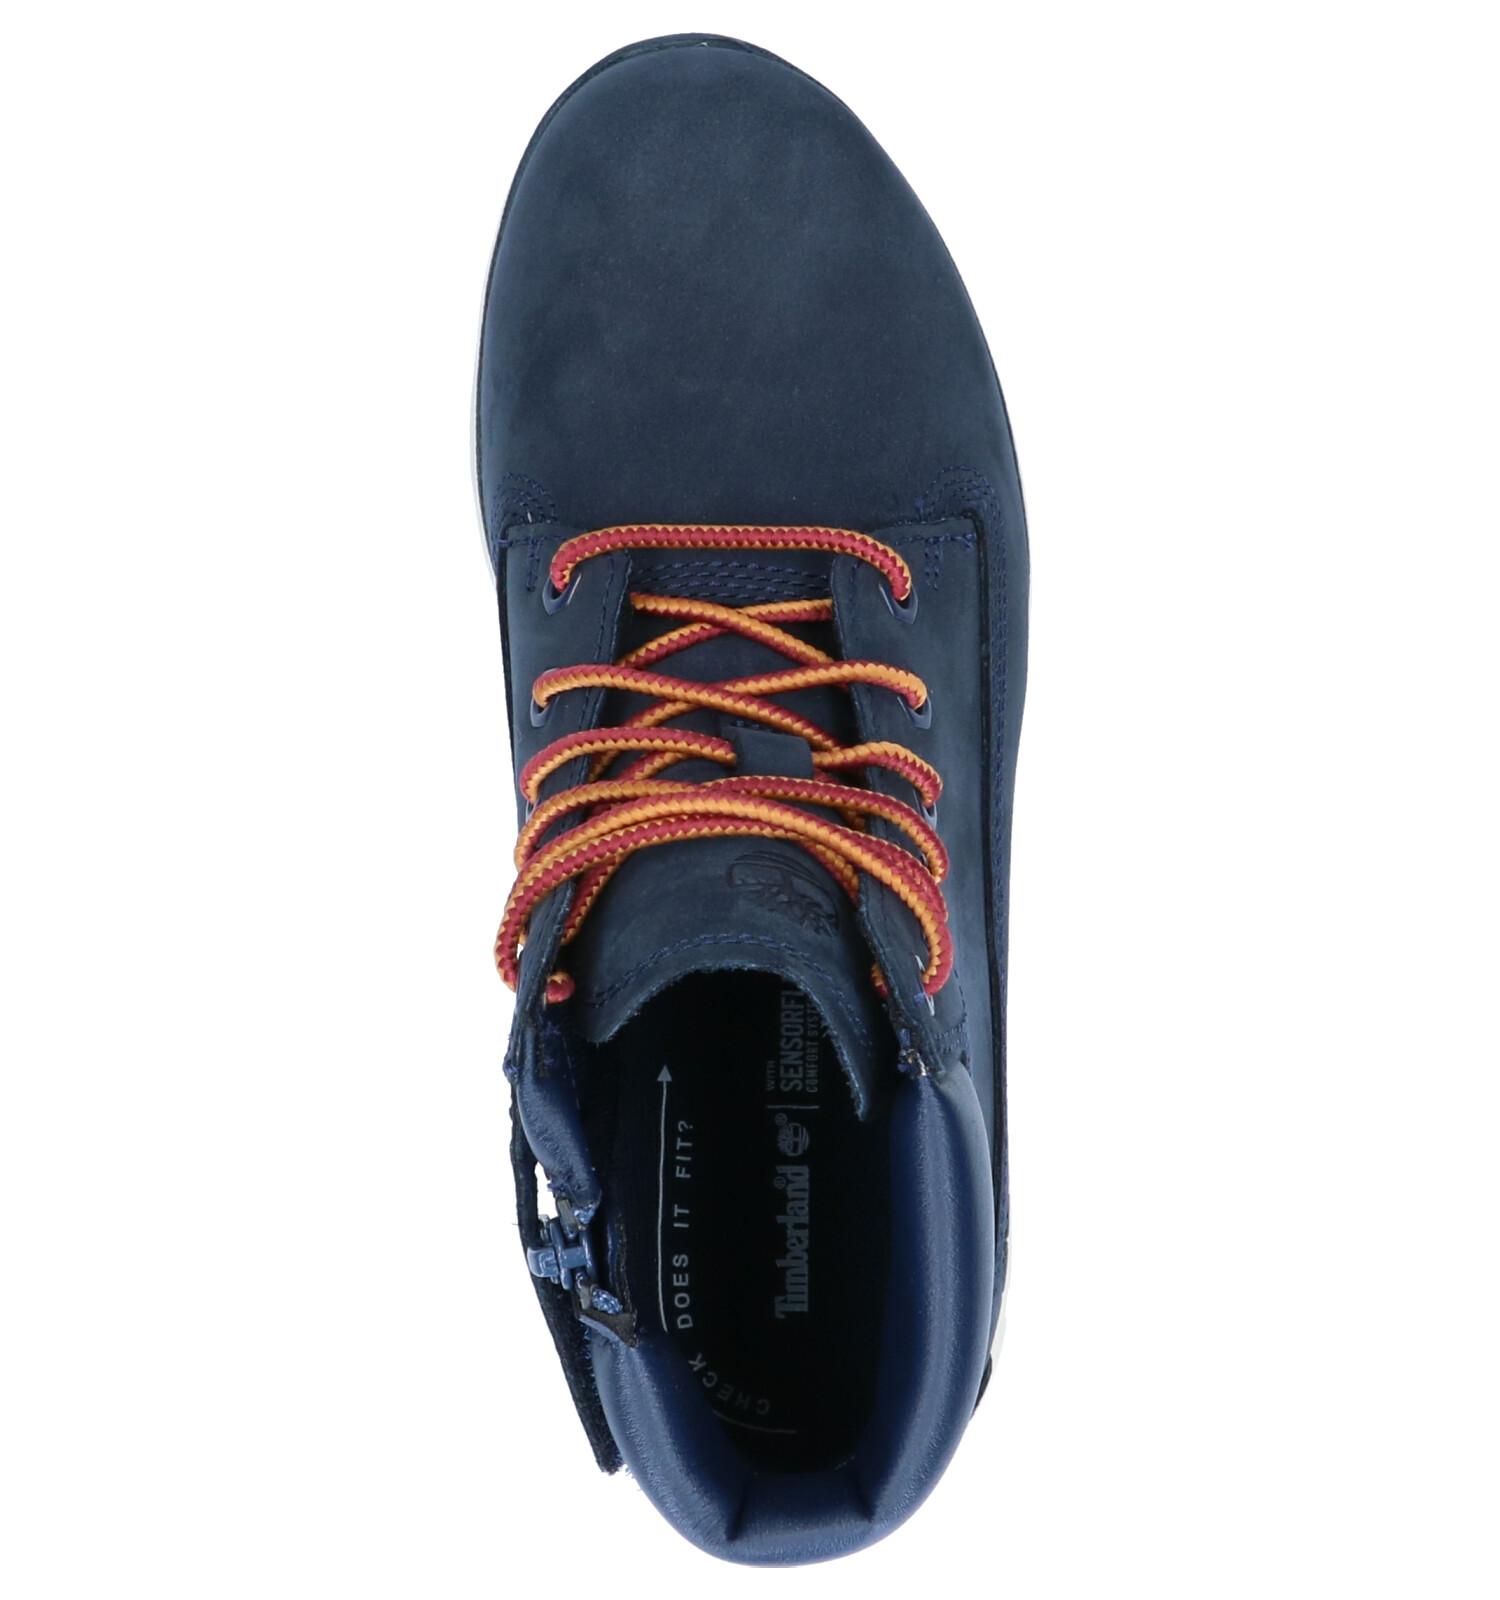 Timberland Killington 6 Inch Blauwe Boots   SCHOENENTORFS.NL